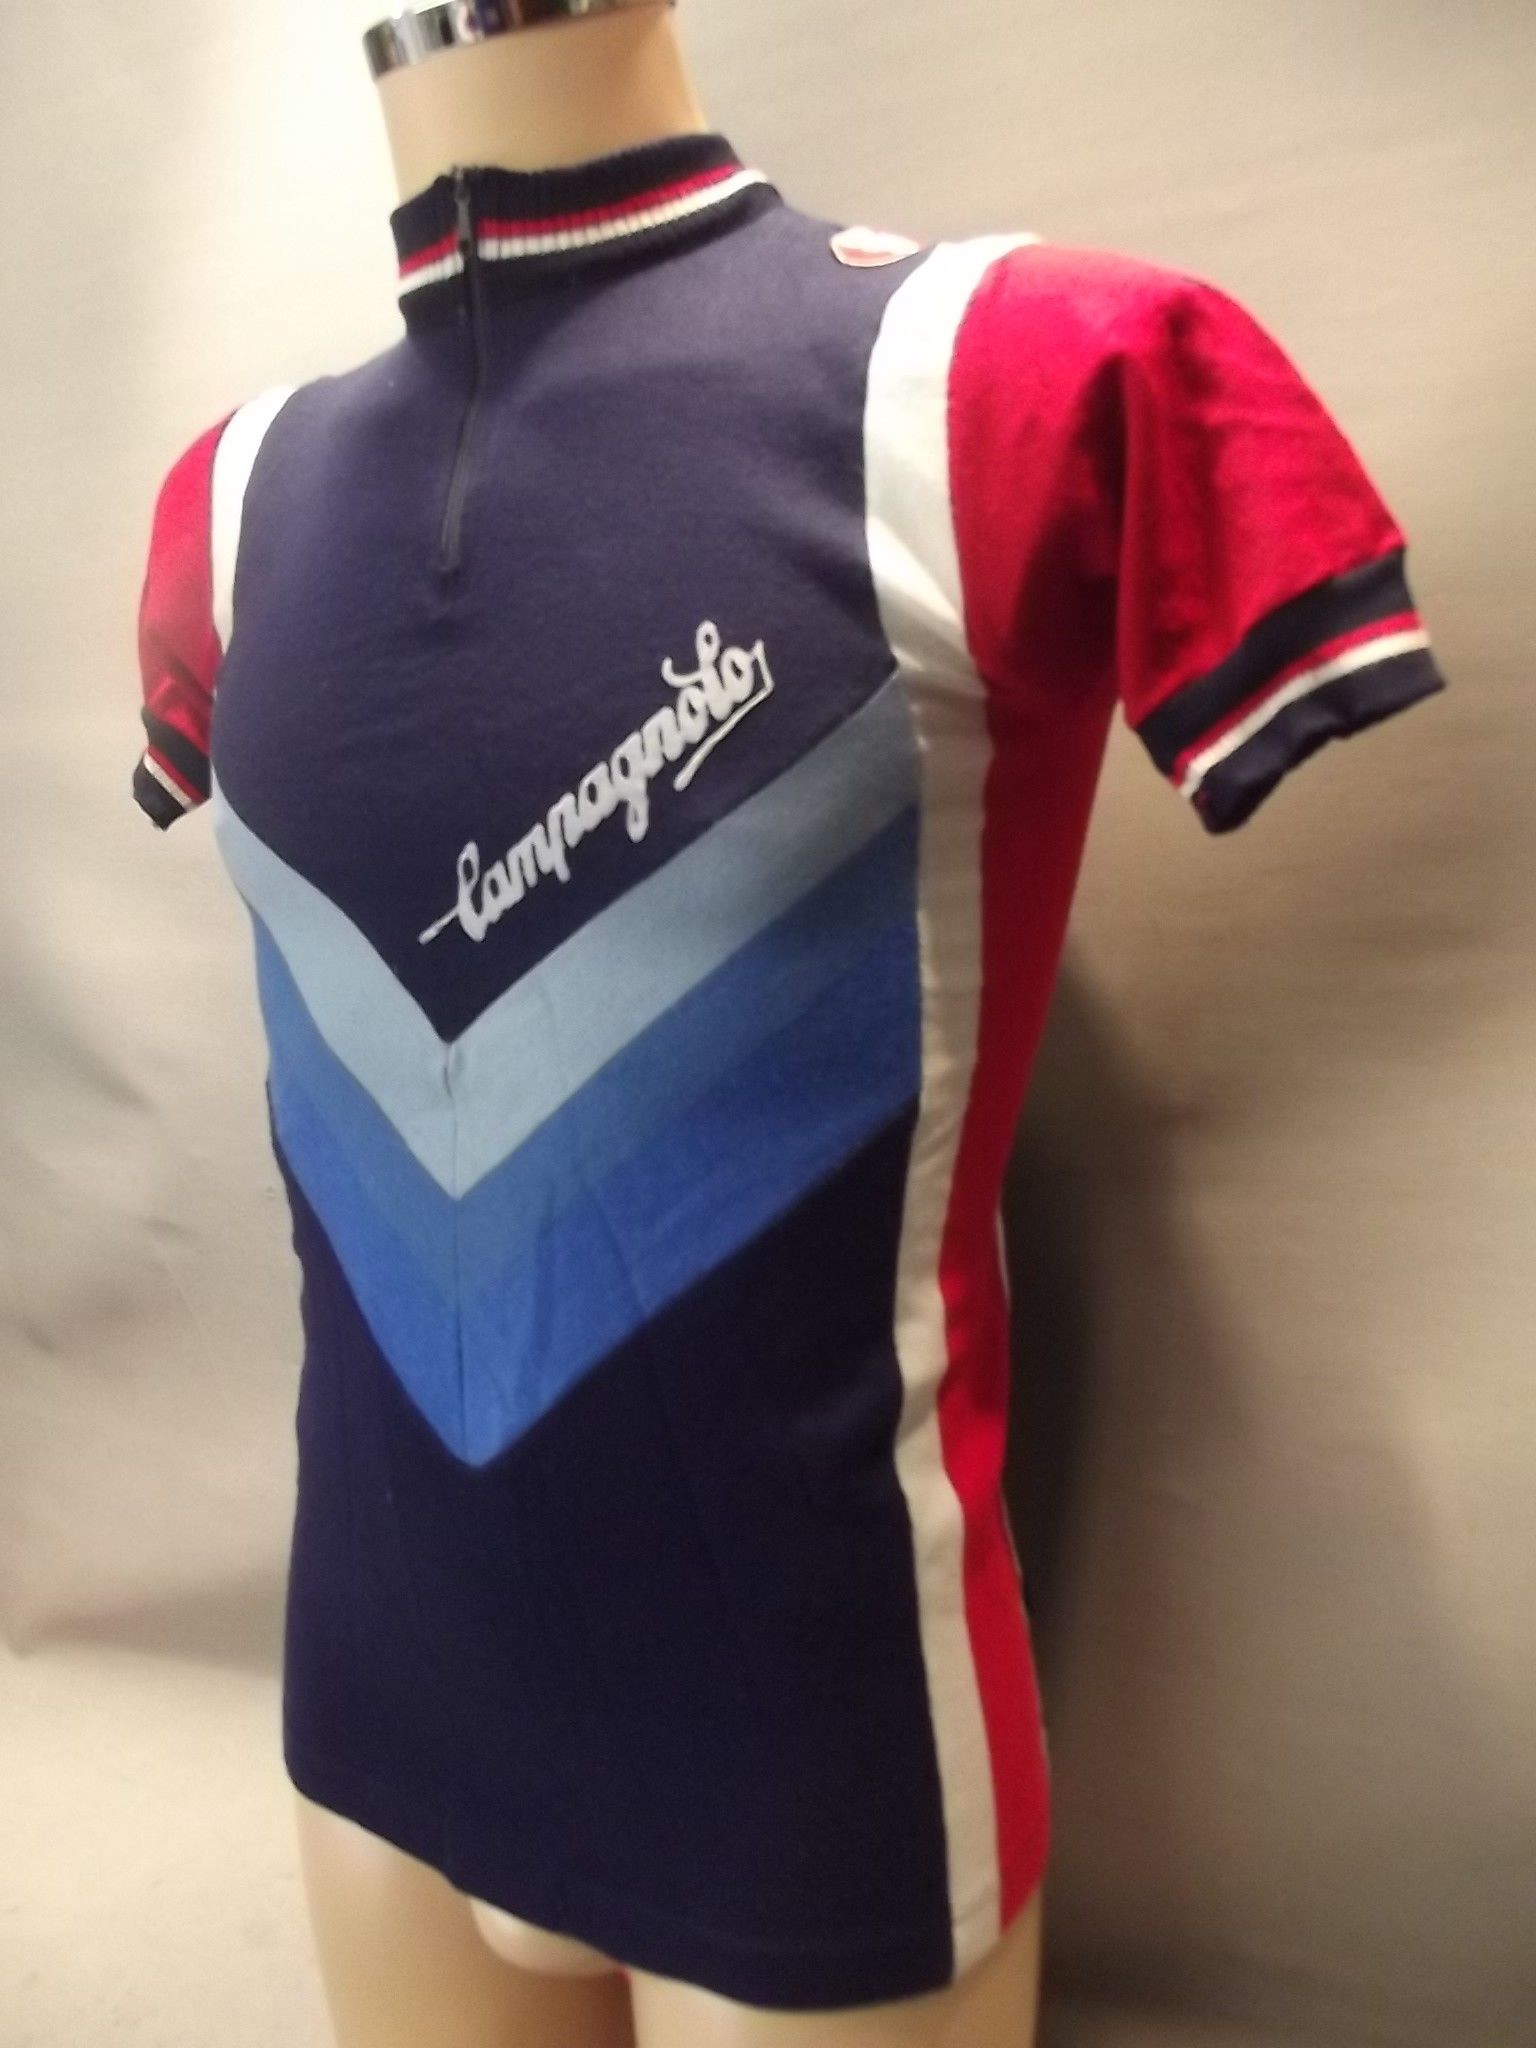 JSVSM003 Vintage Campagnolo cycling short sleeved jersey - Castelli make 1 a77b93c9f